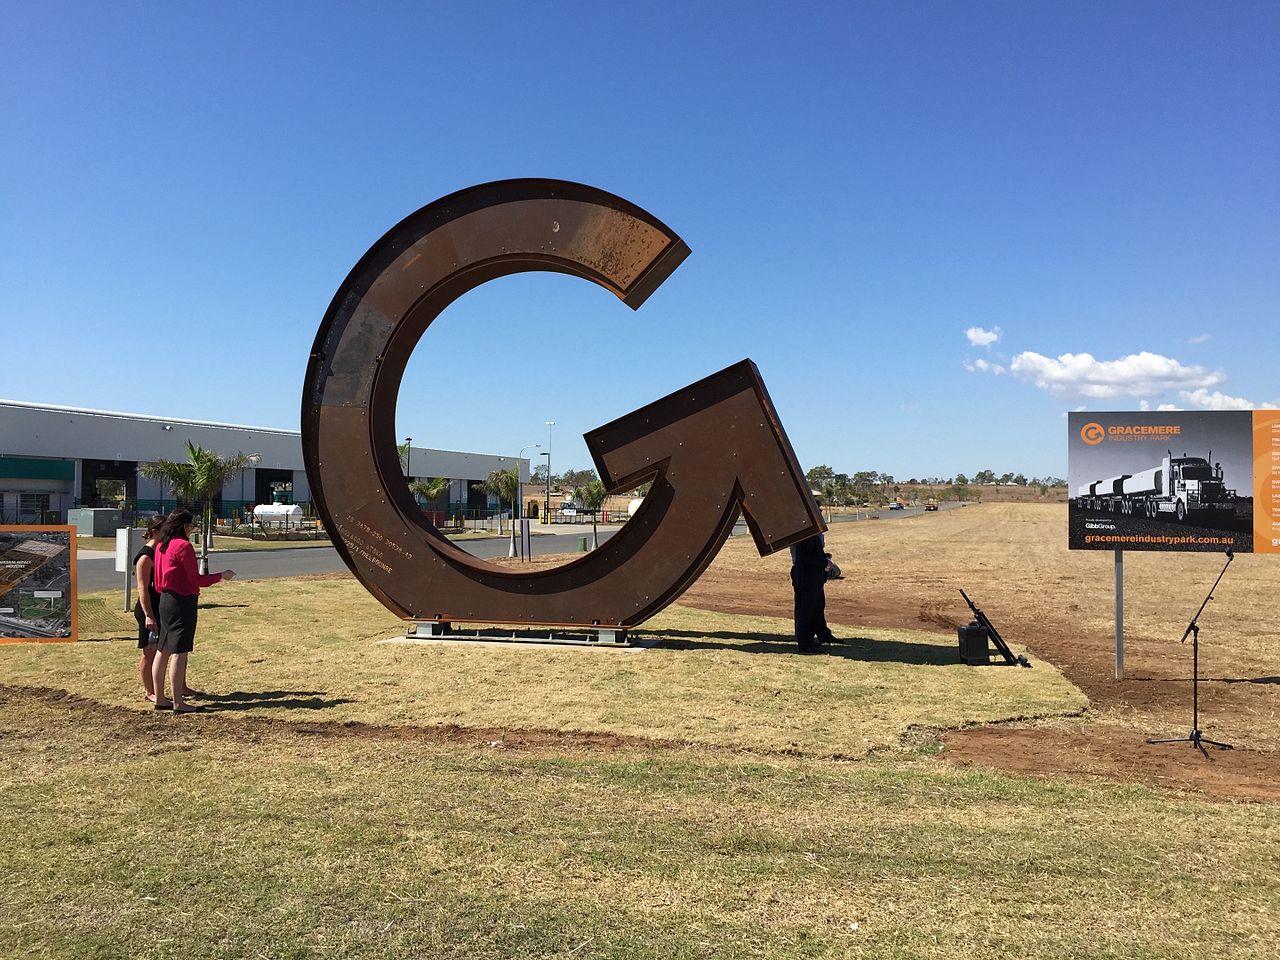 Big G de Gracemere